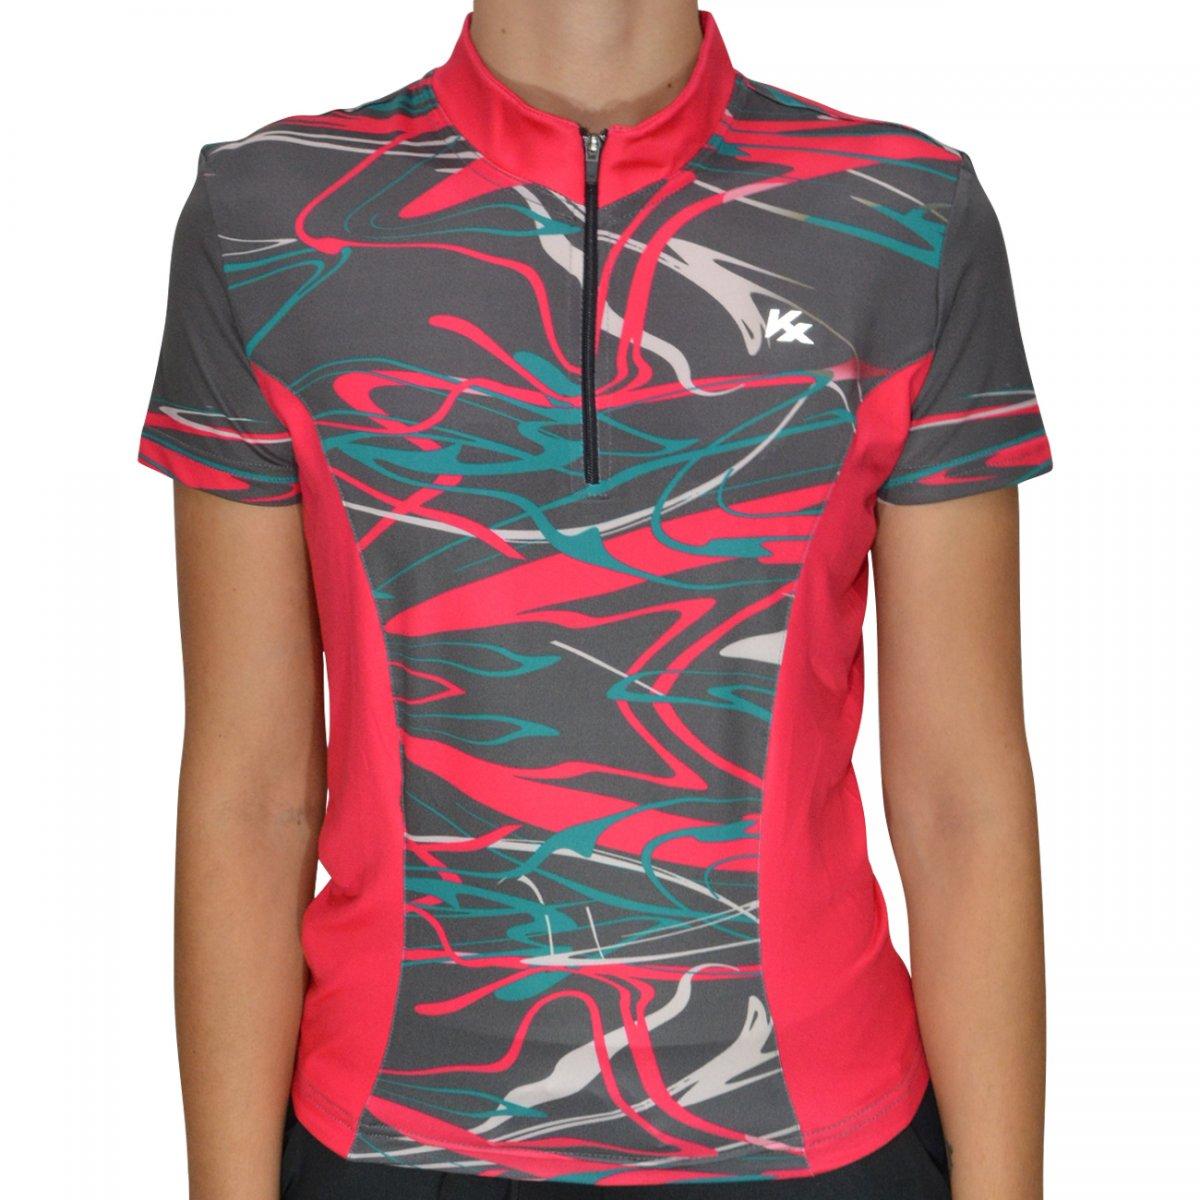 15c17b05127a4 Camisa Kanxa Ciclista Trade 7089 7089 - Rosa/chumbo - Chuteira Nike, Adidas.  Sandalias Femininas. Sandy Calçados